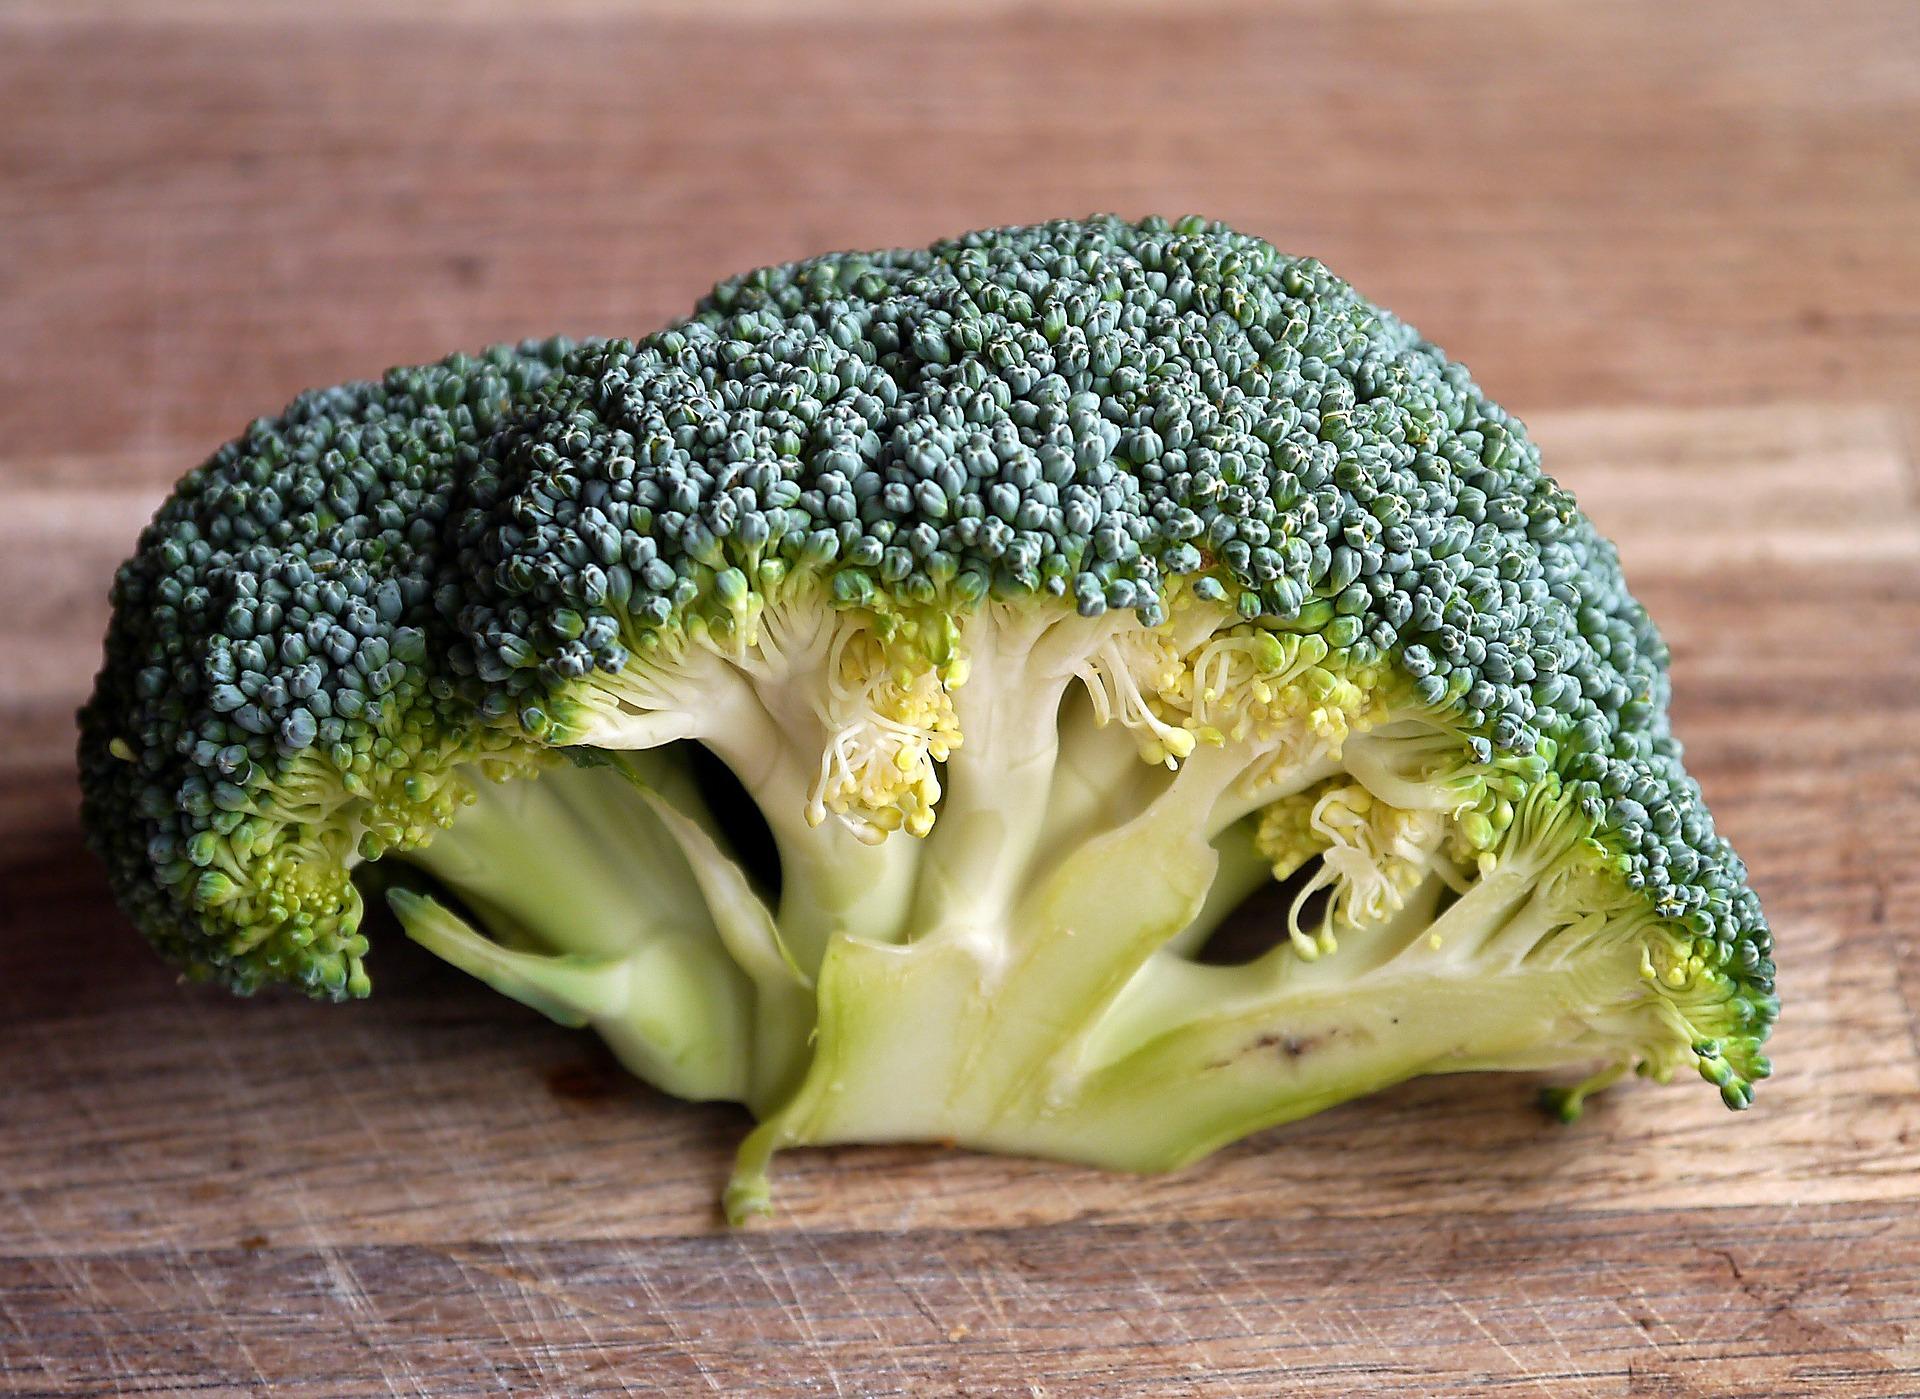 broccoli-498600_1920